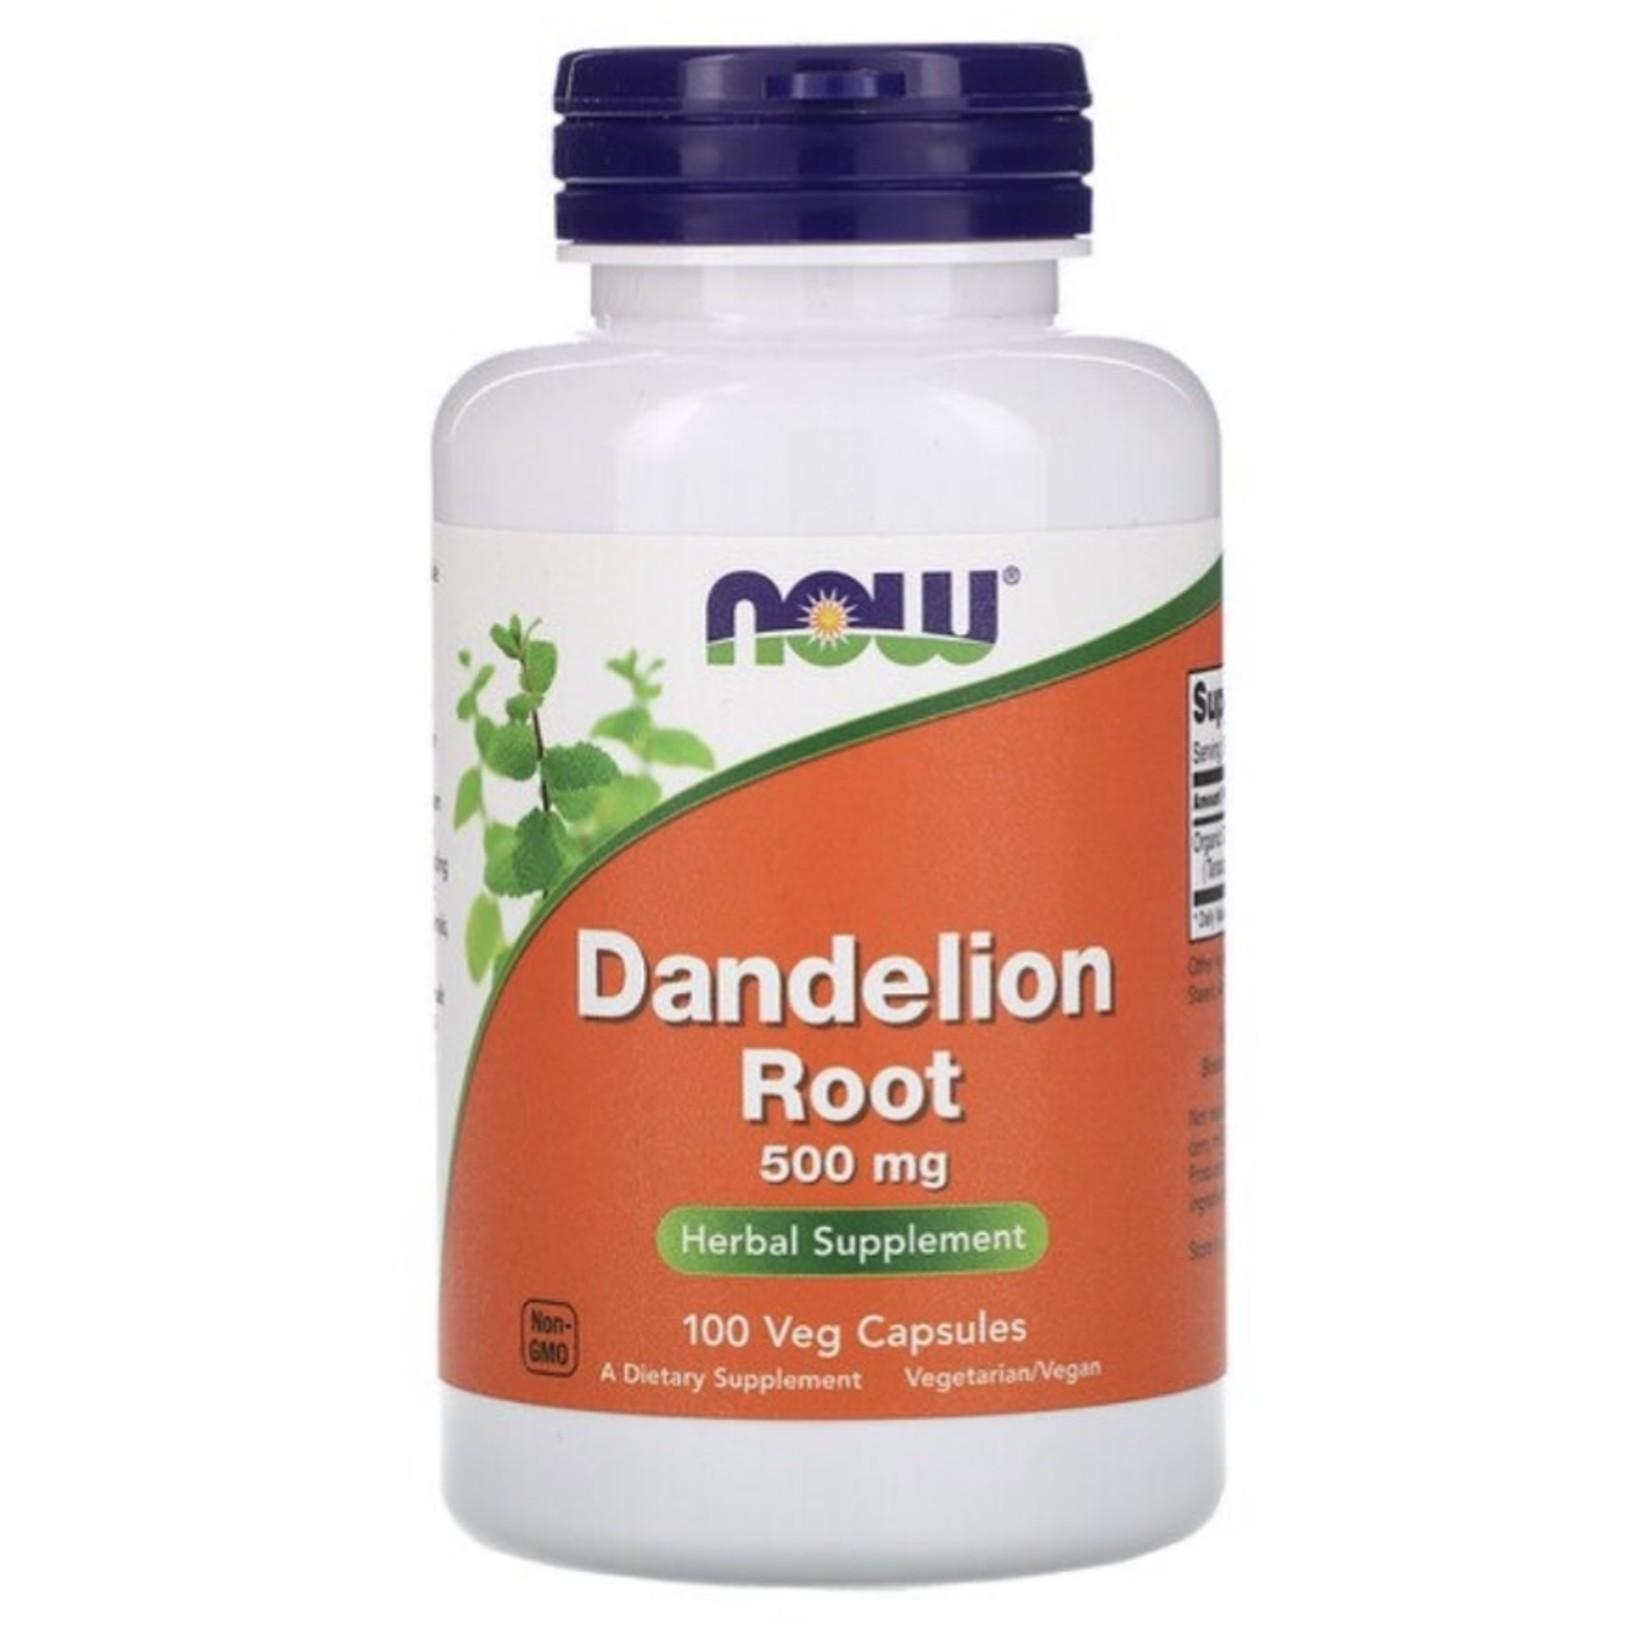 Now Now Dandelion Root 500mg 100 caps